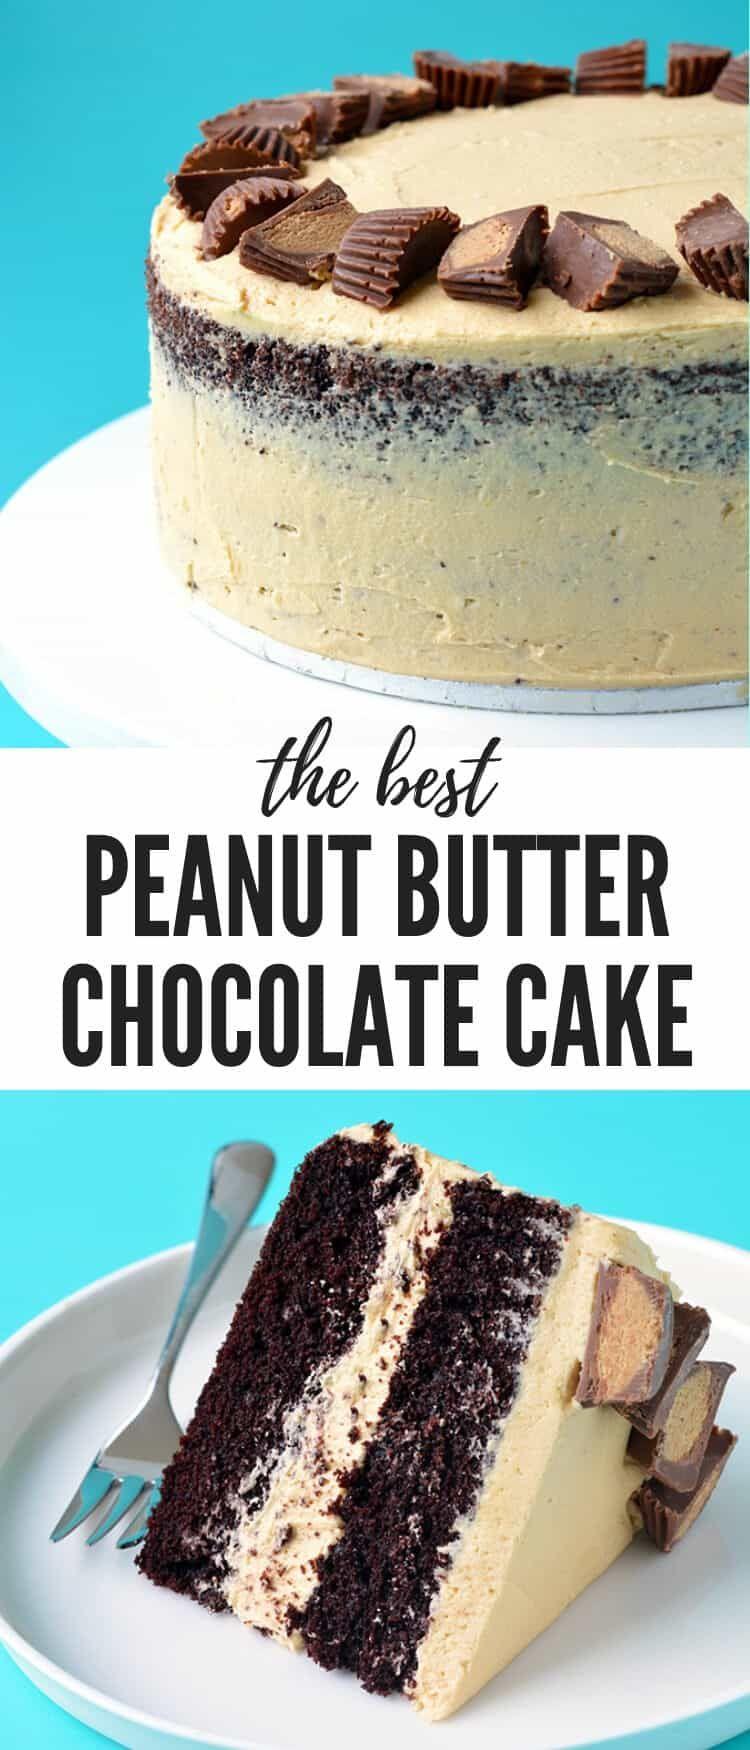 10 desserts Birthday peanut butter cups ideas